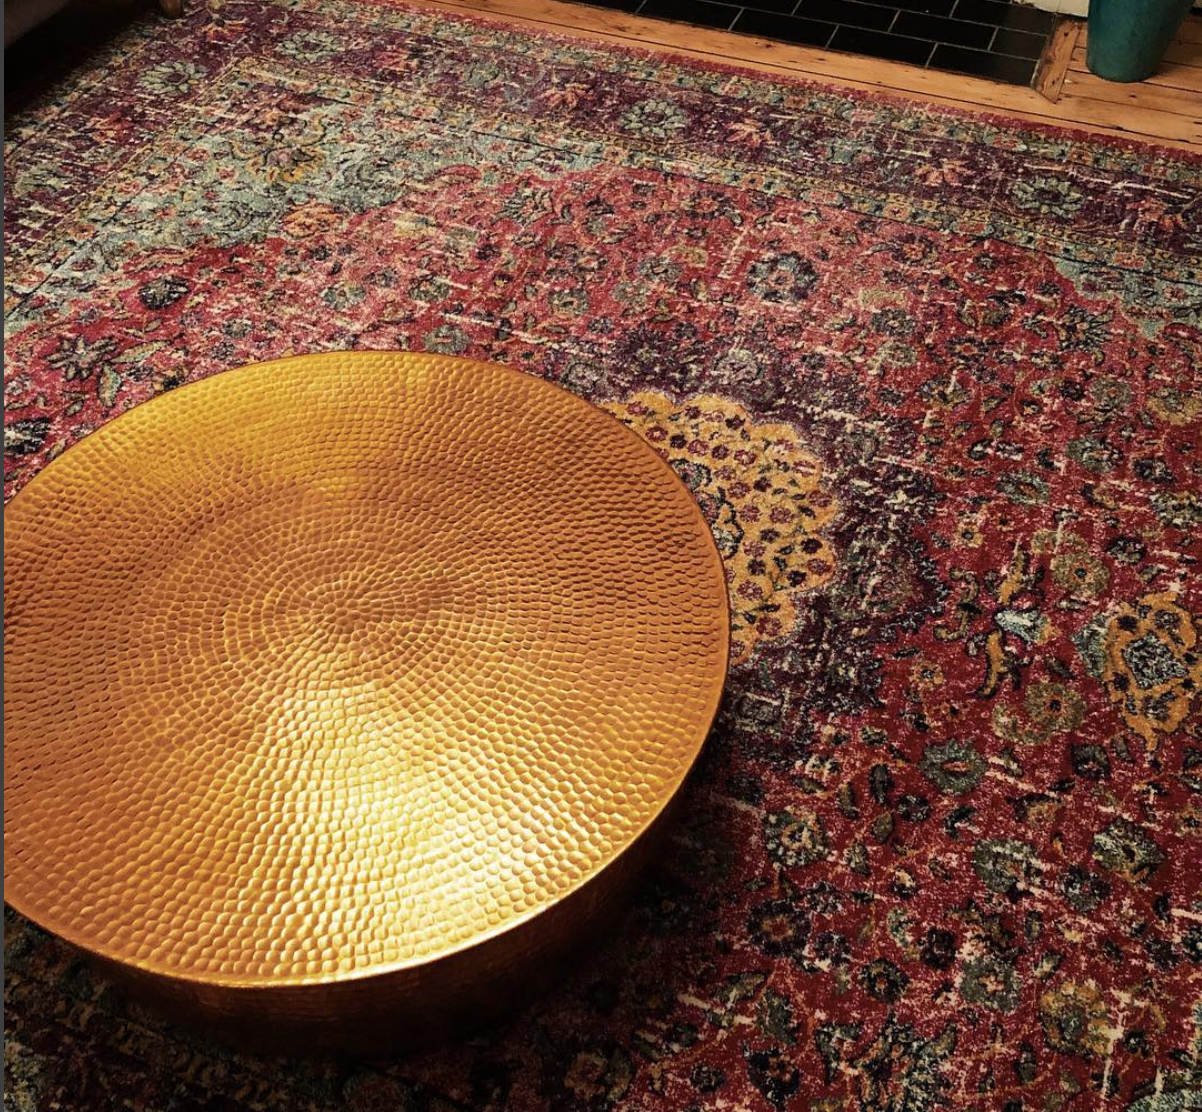 Wayfair.co.uk Darcia rug, Habitat Orrico coffee table